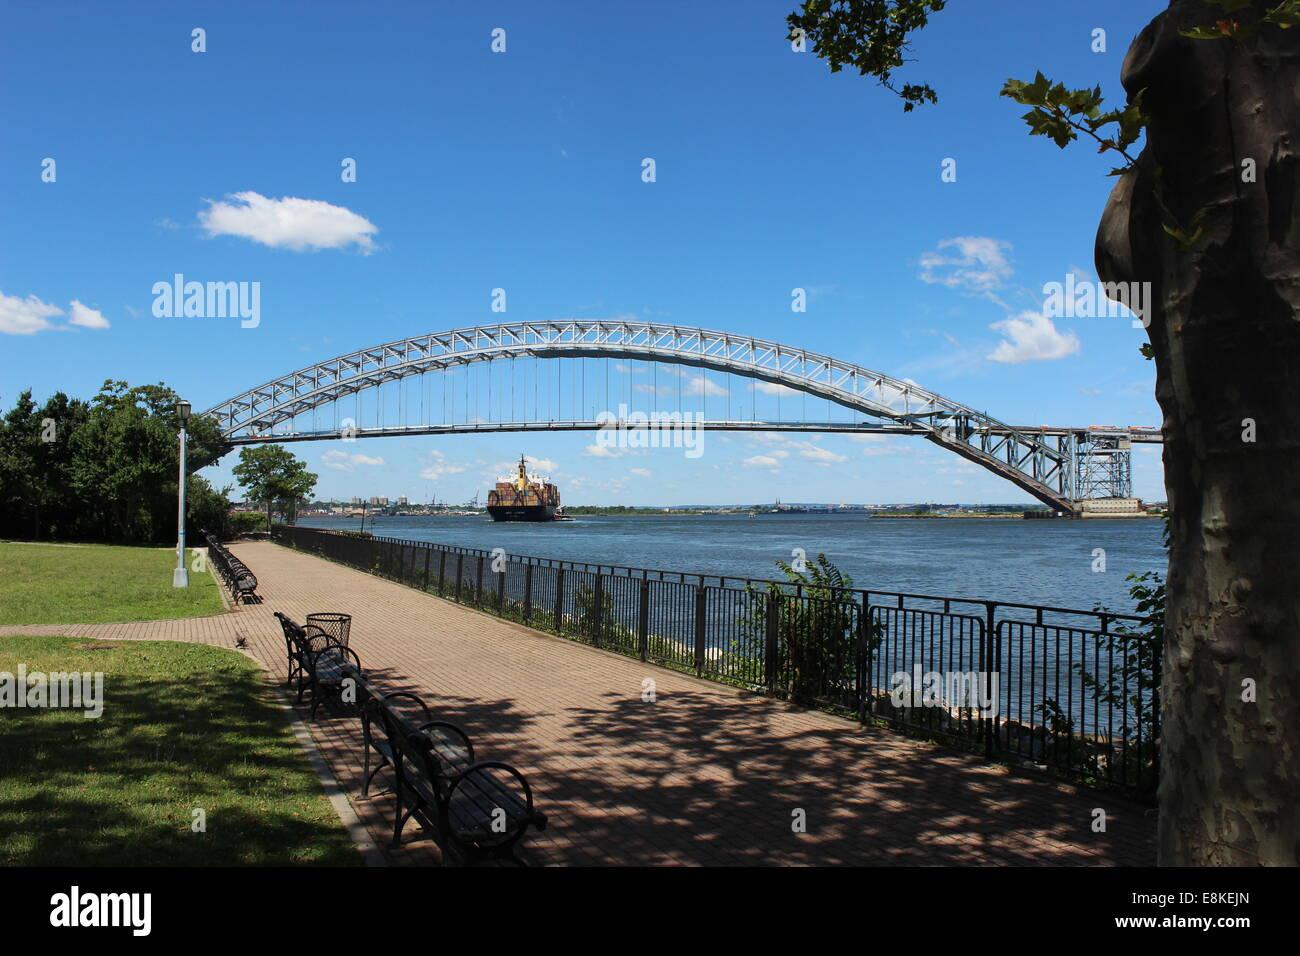 Bayonne Bridge from Staten Island, New York, to Bayonne, New Jersey. Opened 1931. - Stock Image